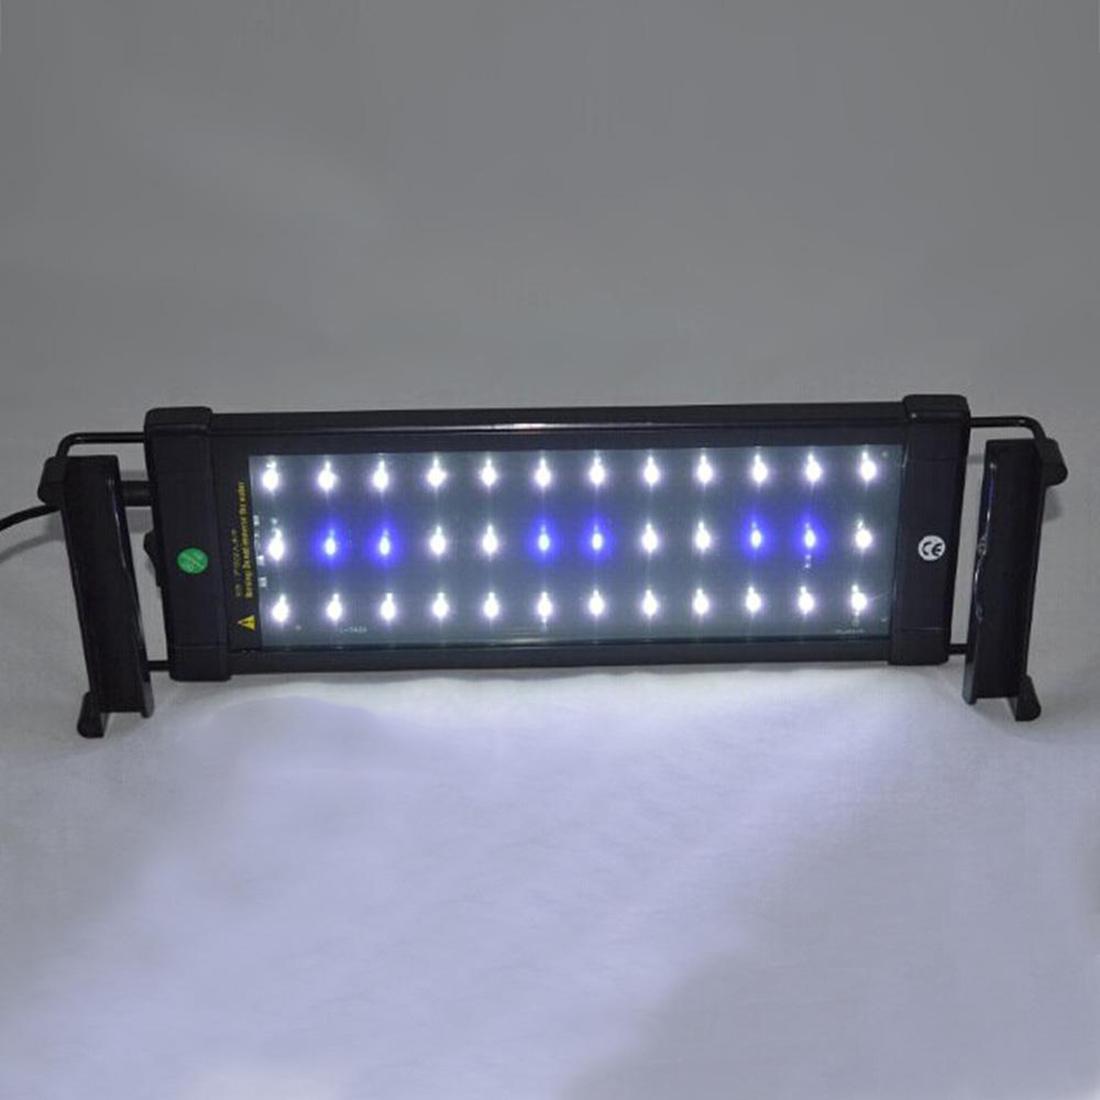 Fish aquarium light bulbs - High Quality 6w Ultra Thin Led Aquarium Lighting Bulb Lamp New Blue Light 2 Mode Abs